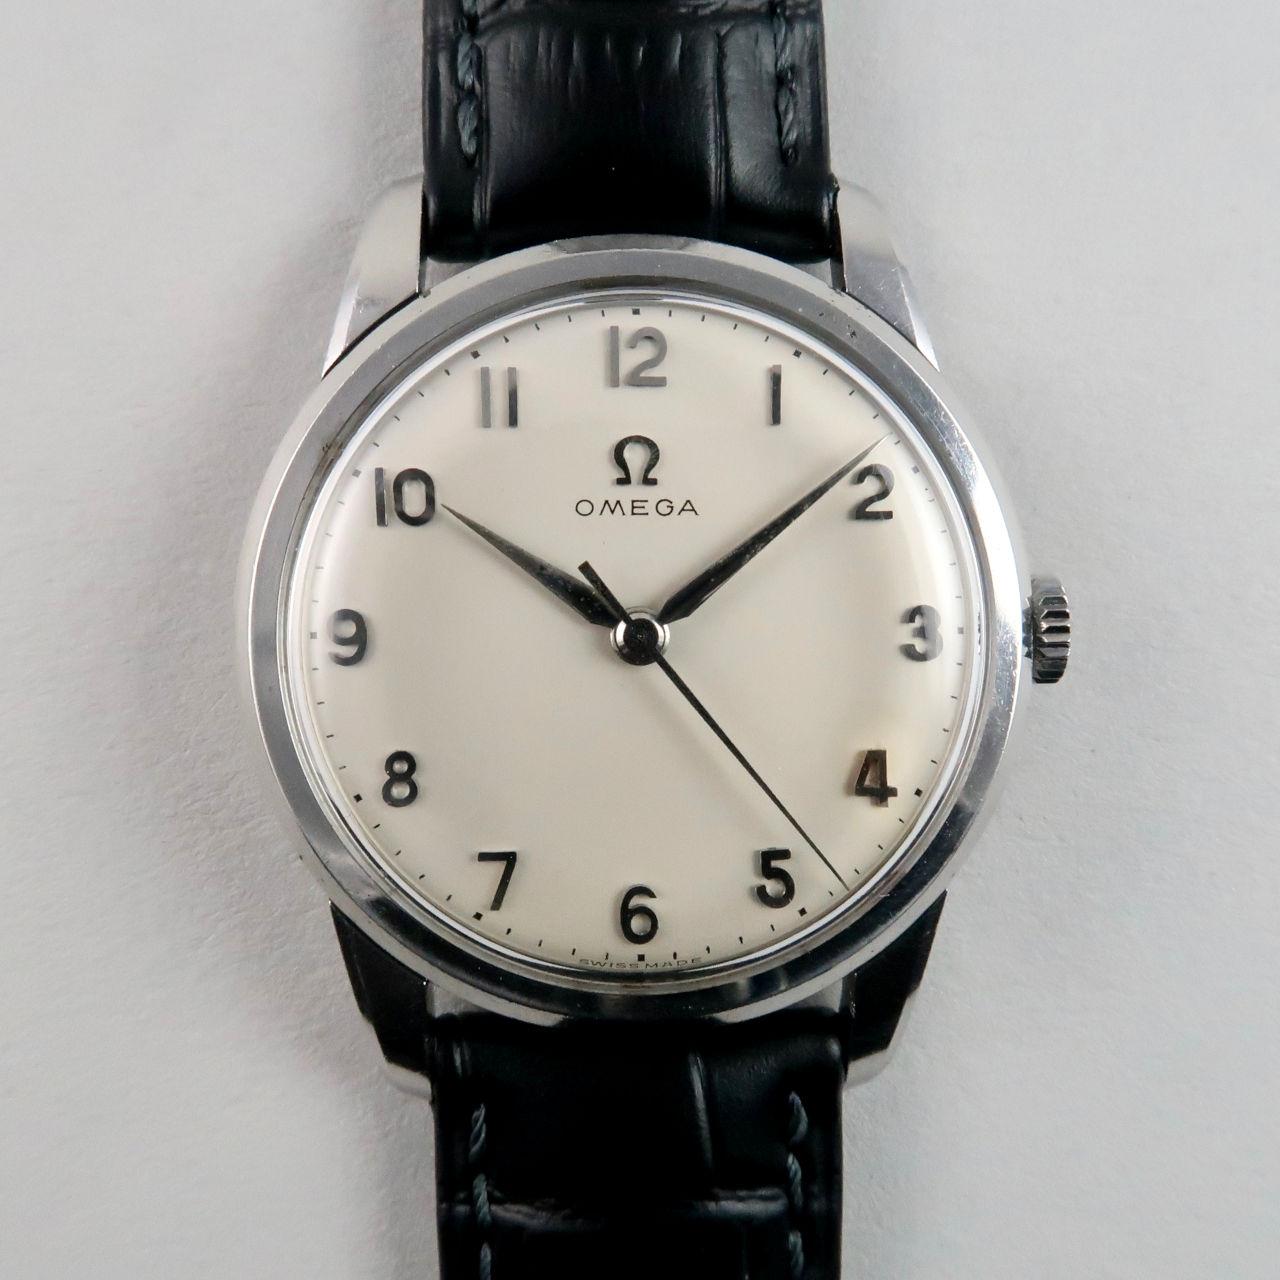 Omega Ref. 14726 -1 SC steel vintage wristwatch, circa 1959